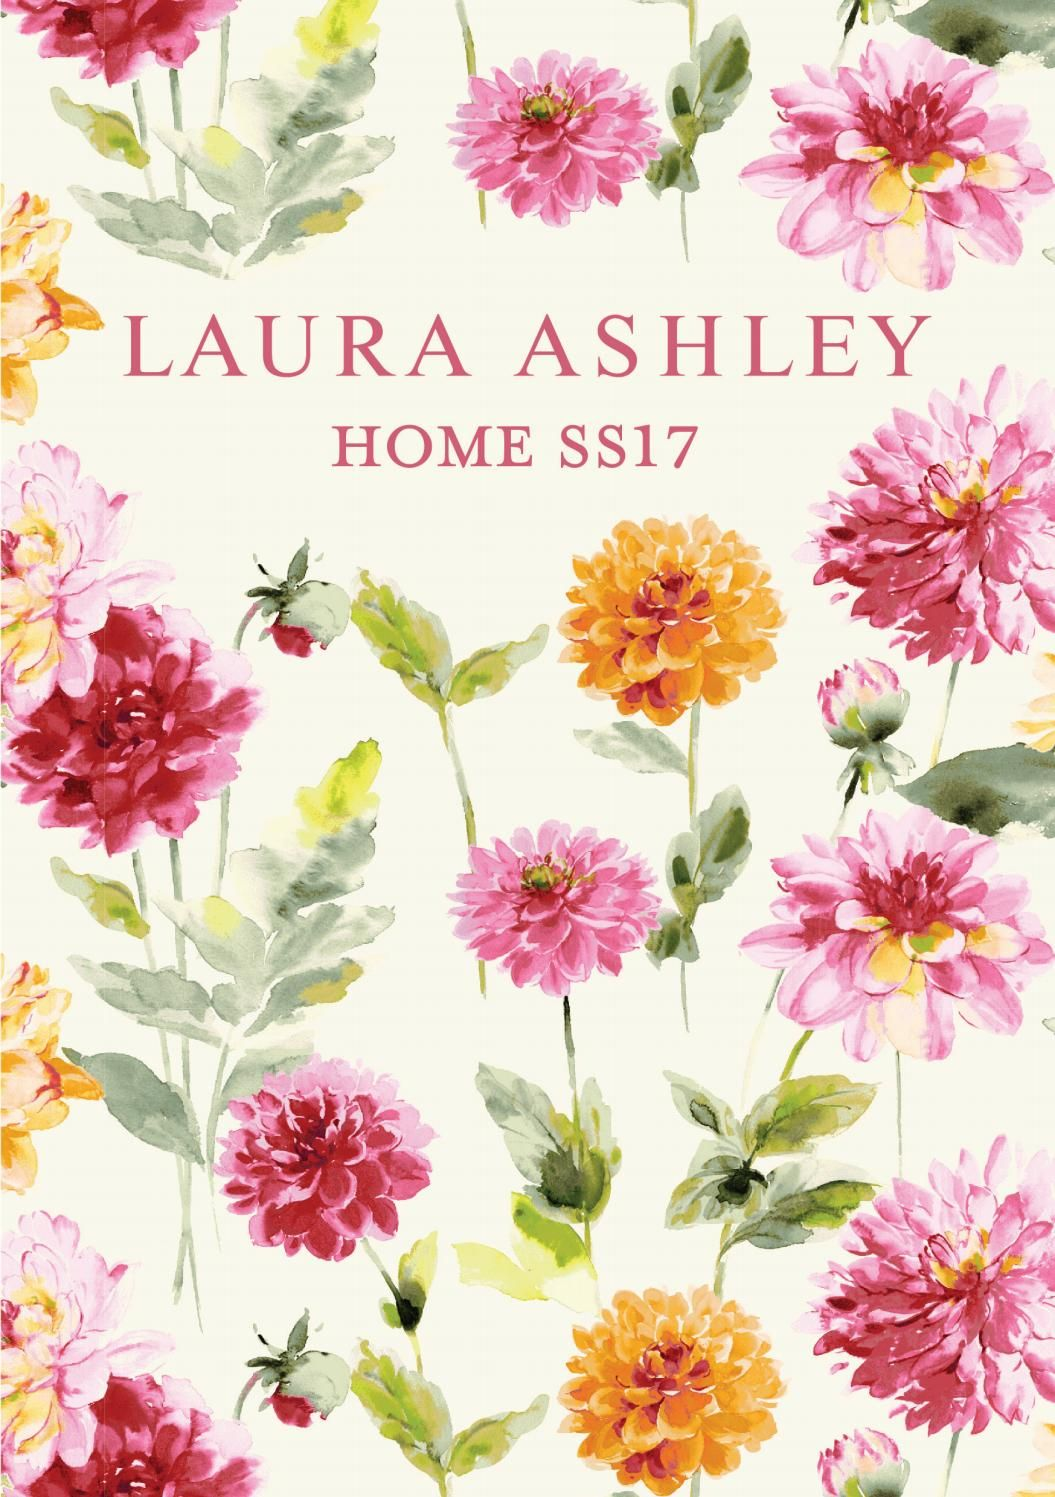 Laura Ashley Home Ss17 Lookbook En 2018 Laura Ashley Pinterest